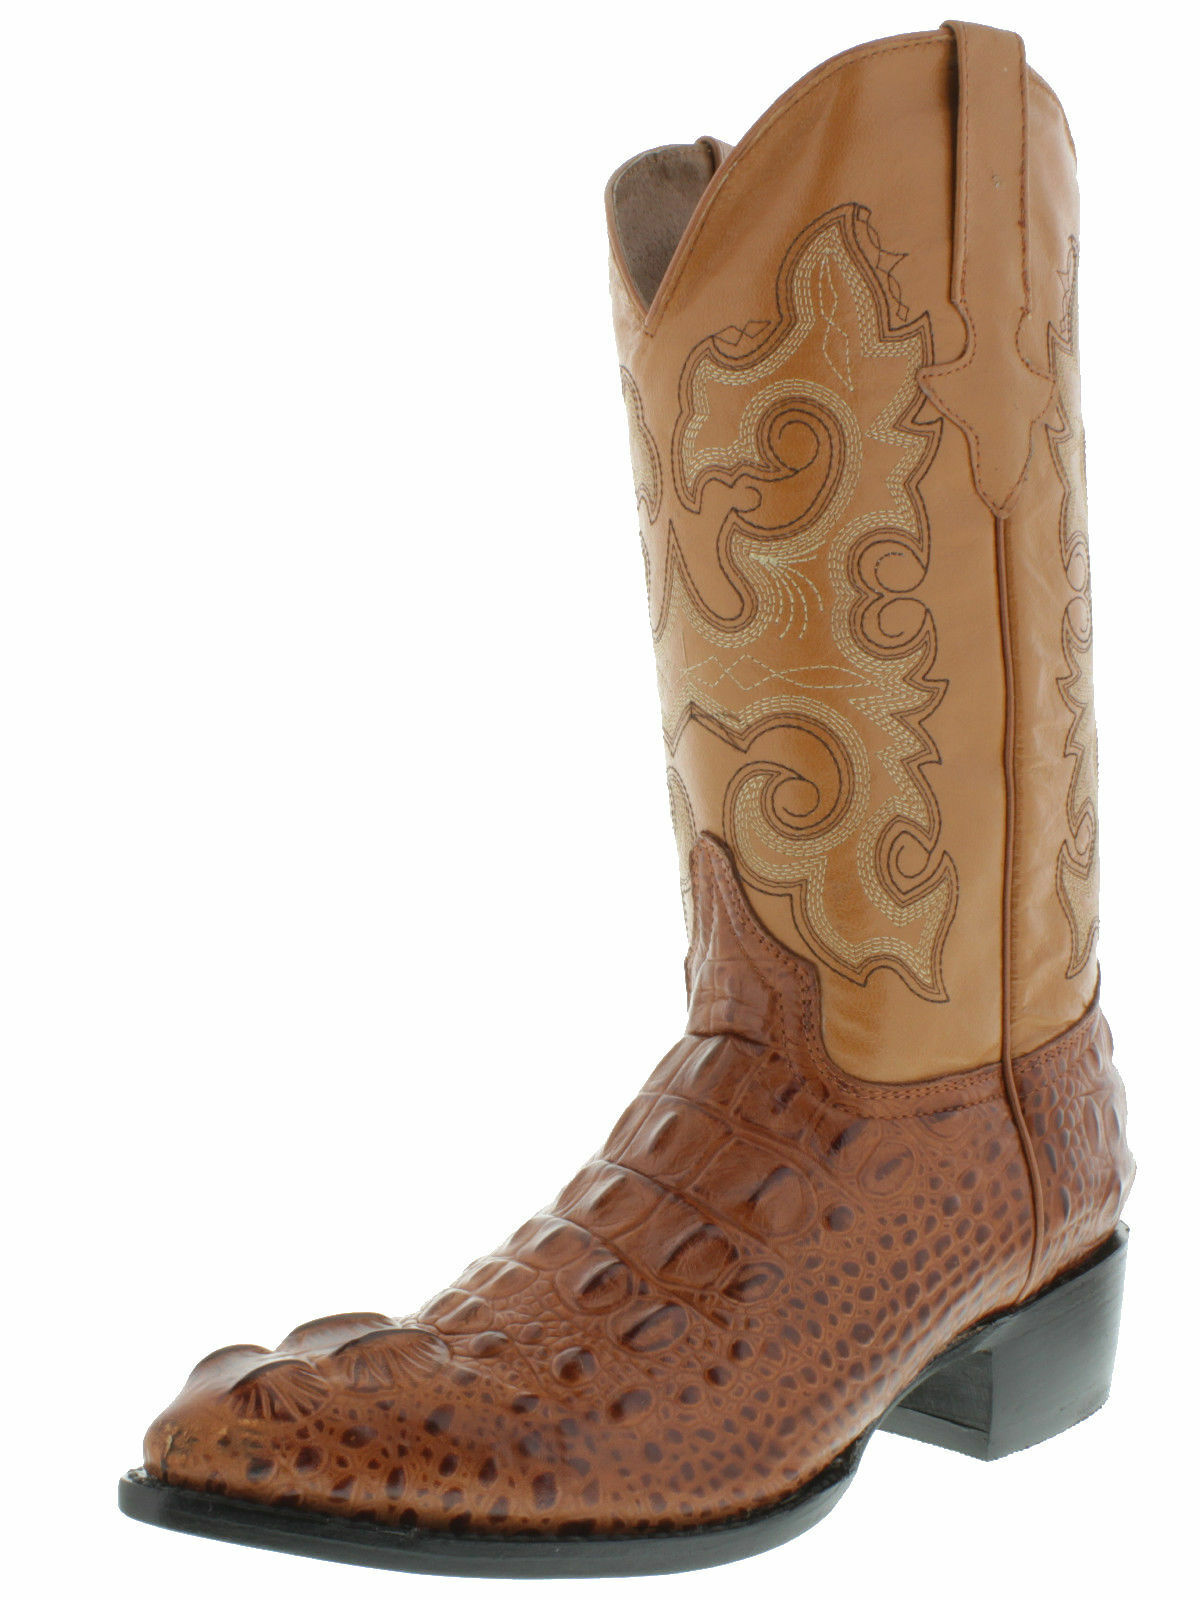 Mens' New Leather Crocodile Head Design Rodeo Western Cowboy Stiefel J Toe Cognac